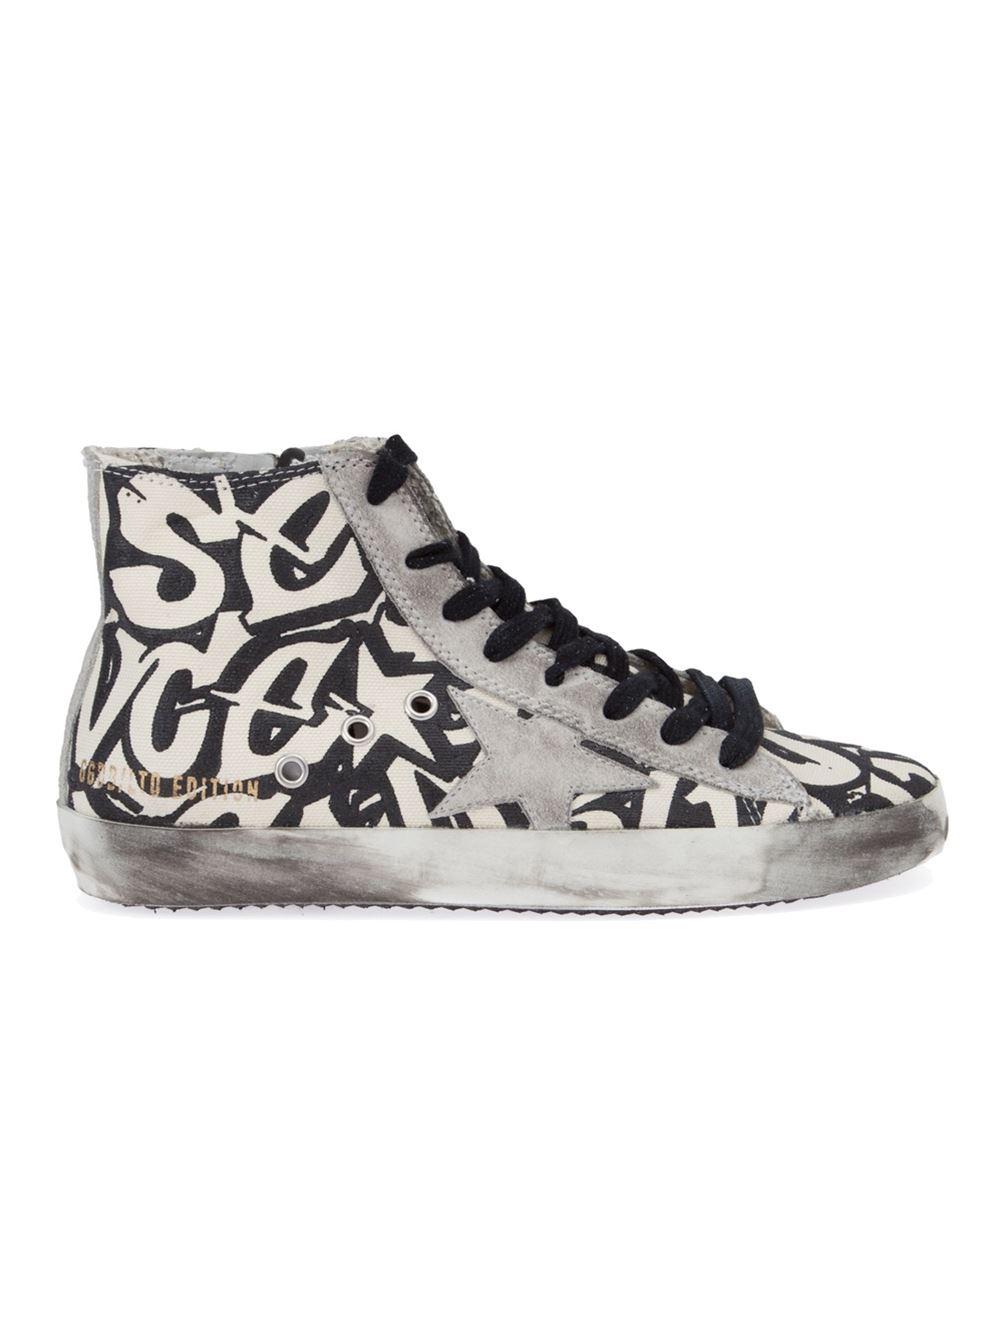 golden goose deluxe brand graffiti print hi top sneakers in white lyst. Black Bedroom Furniture Sets. Home Design Ideas